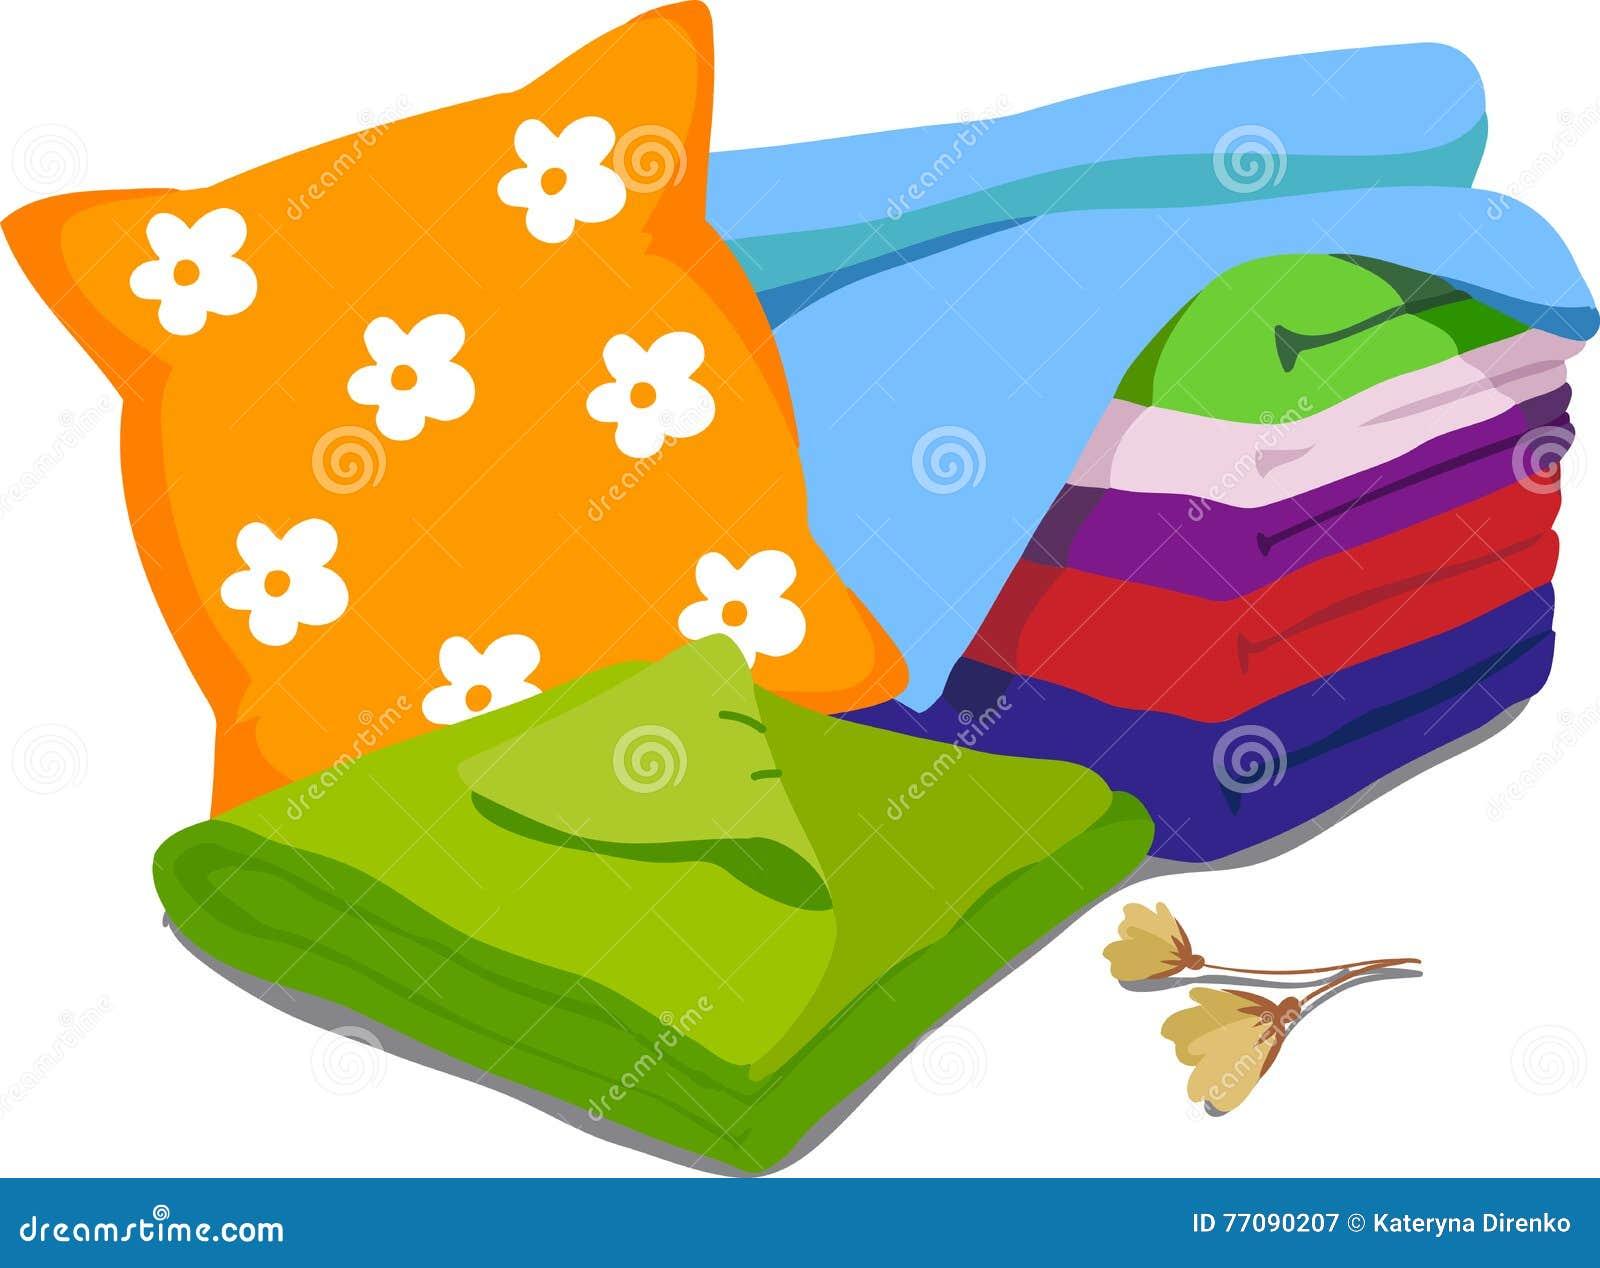 Color bed linen